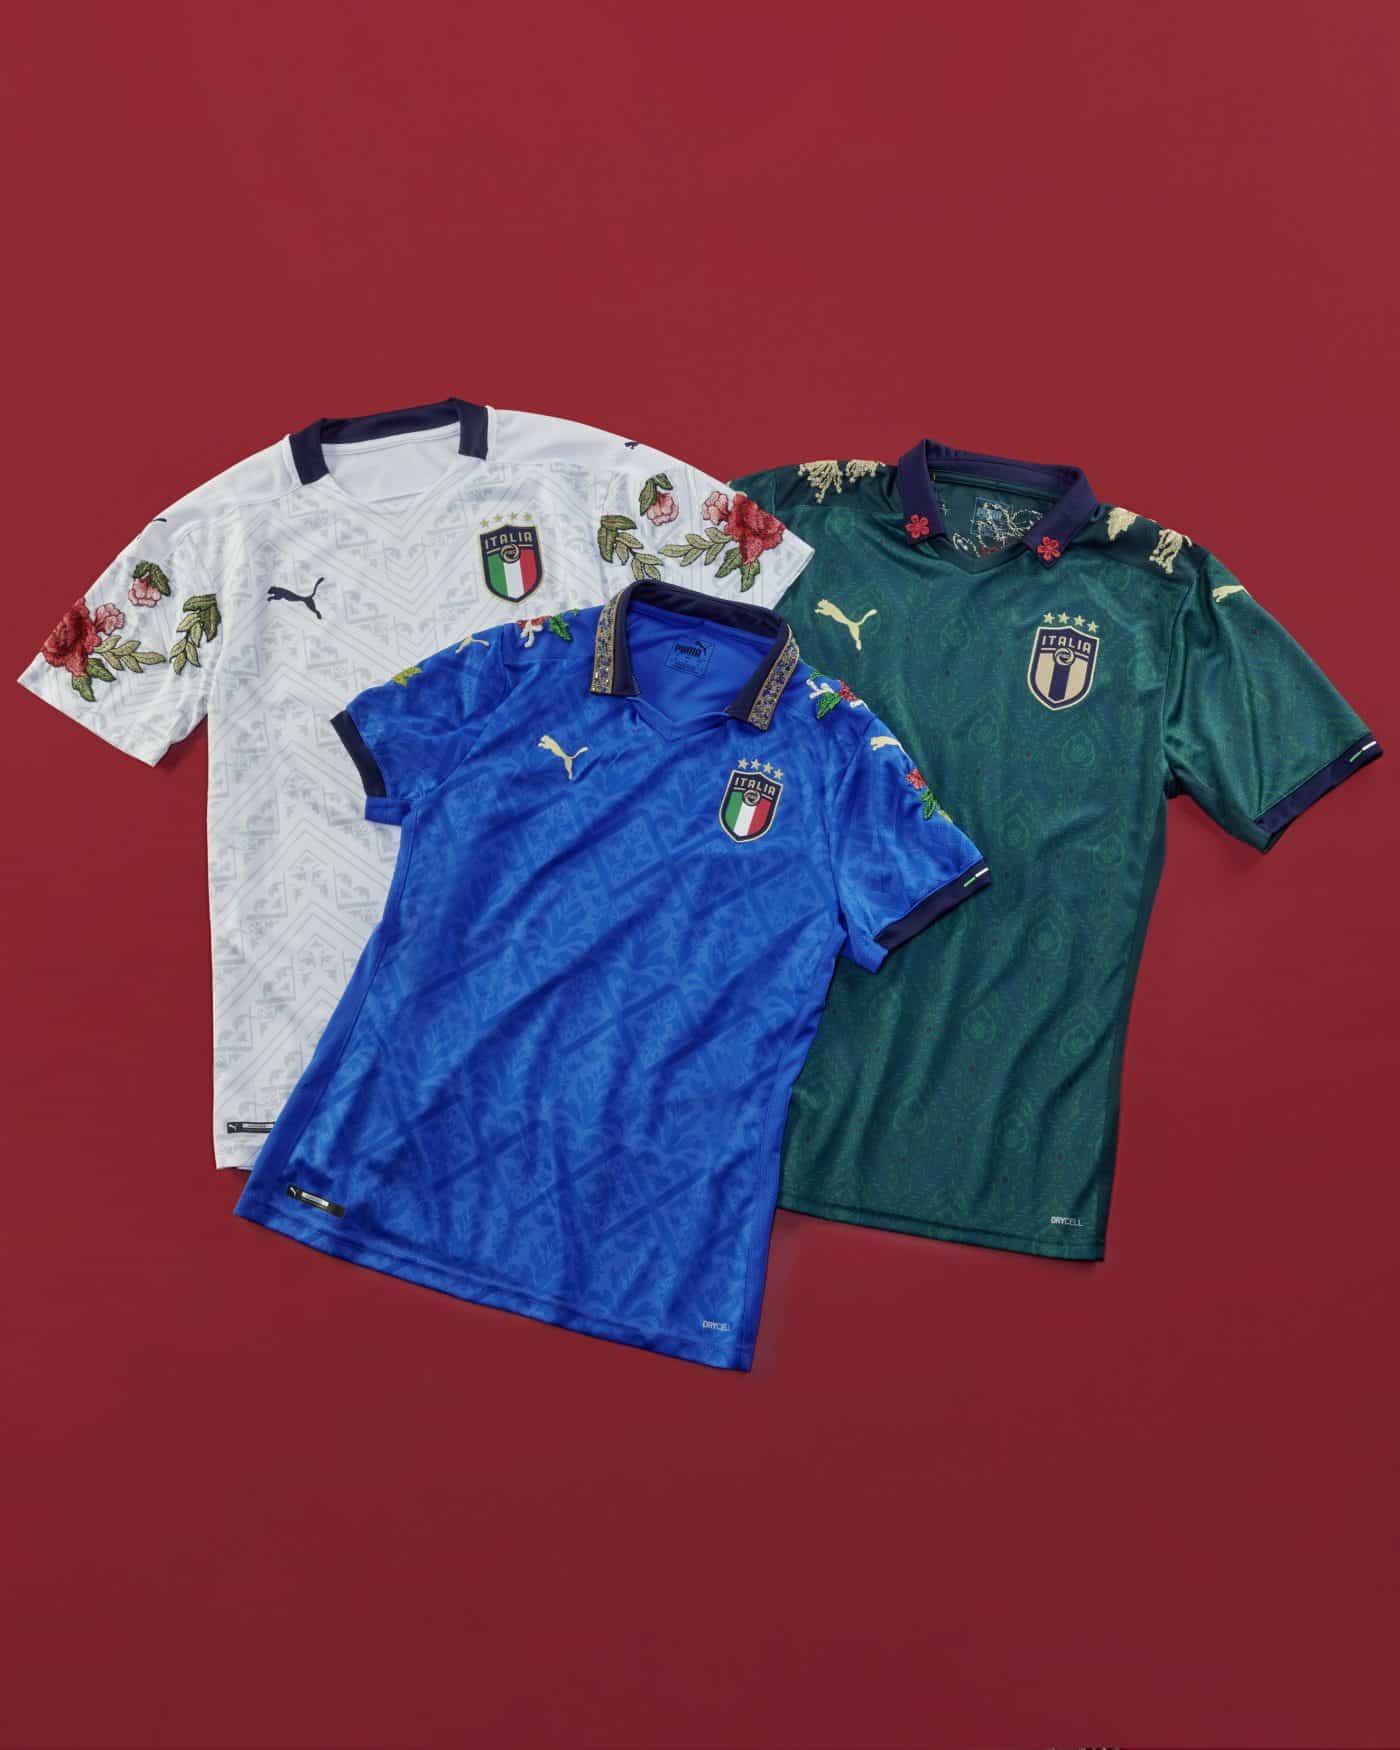 maillot-italie-renaissance-the-football-gall-2